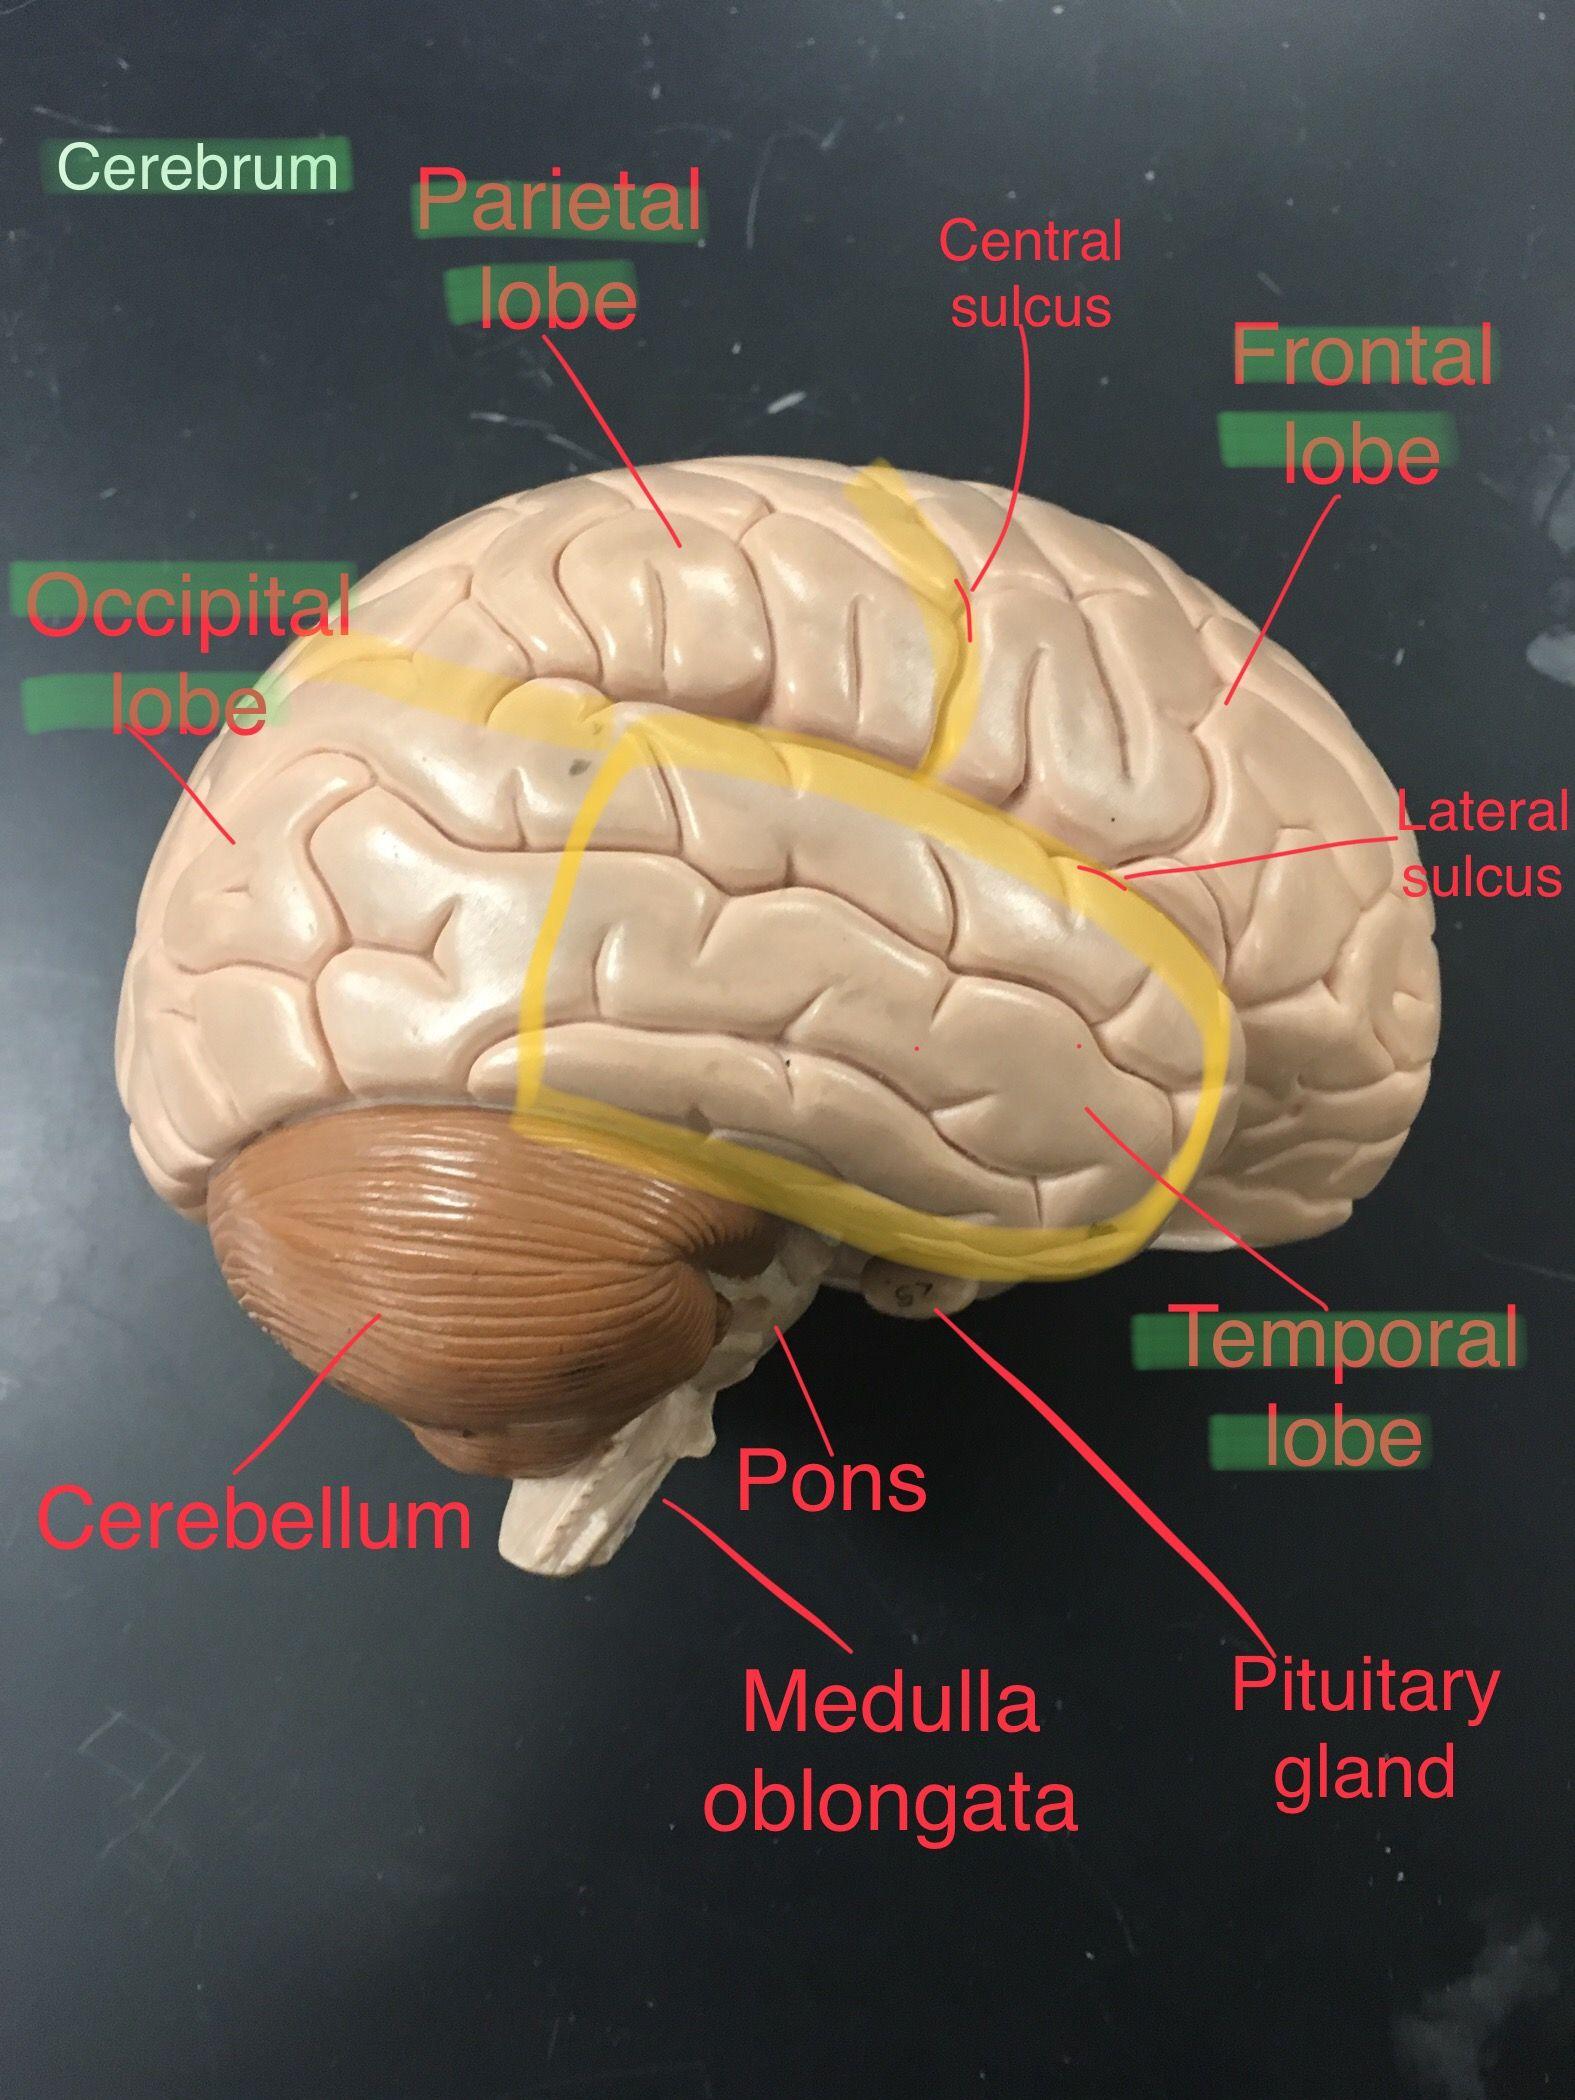 Brain lobes - labeled | Brain lobes, Occipital lobe, Occipital